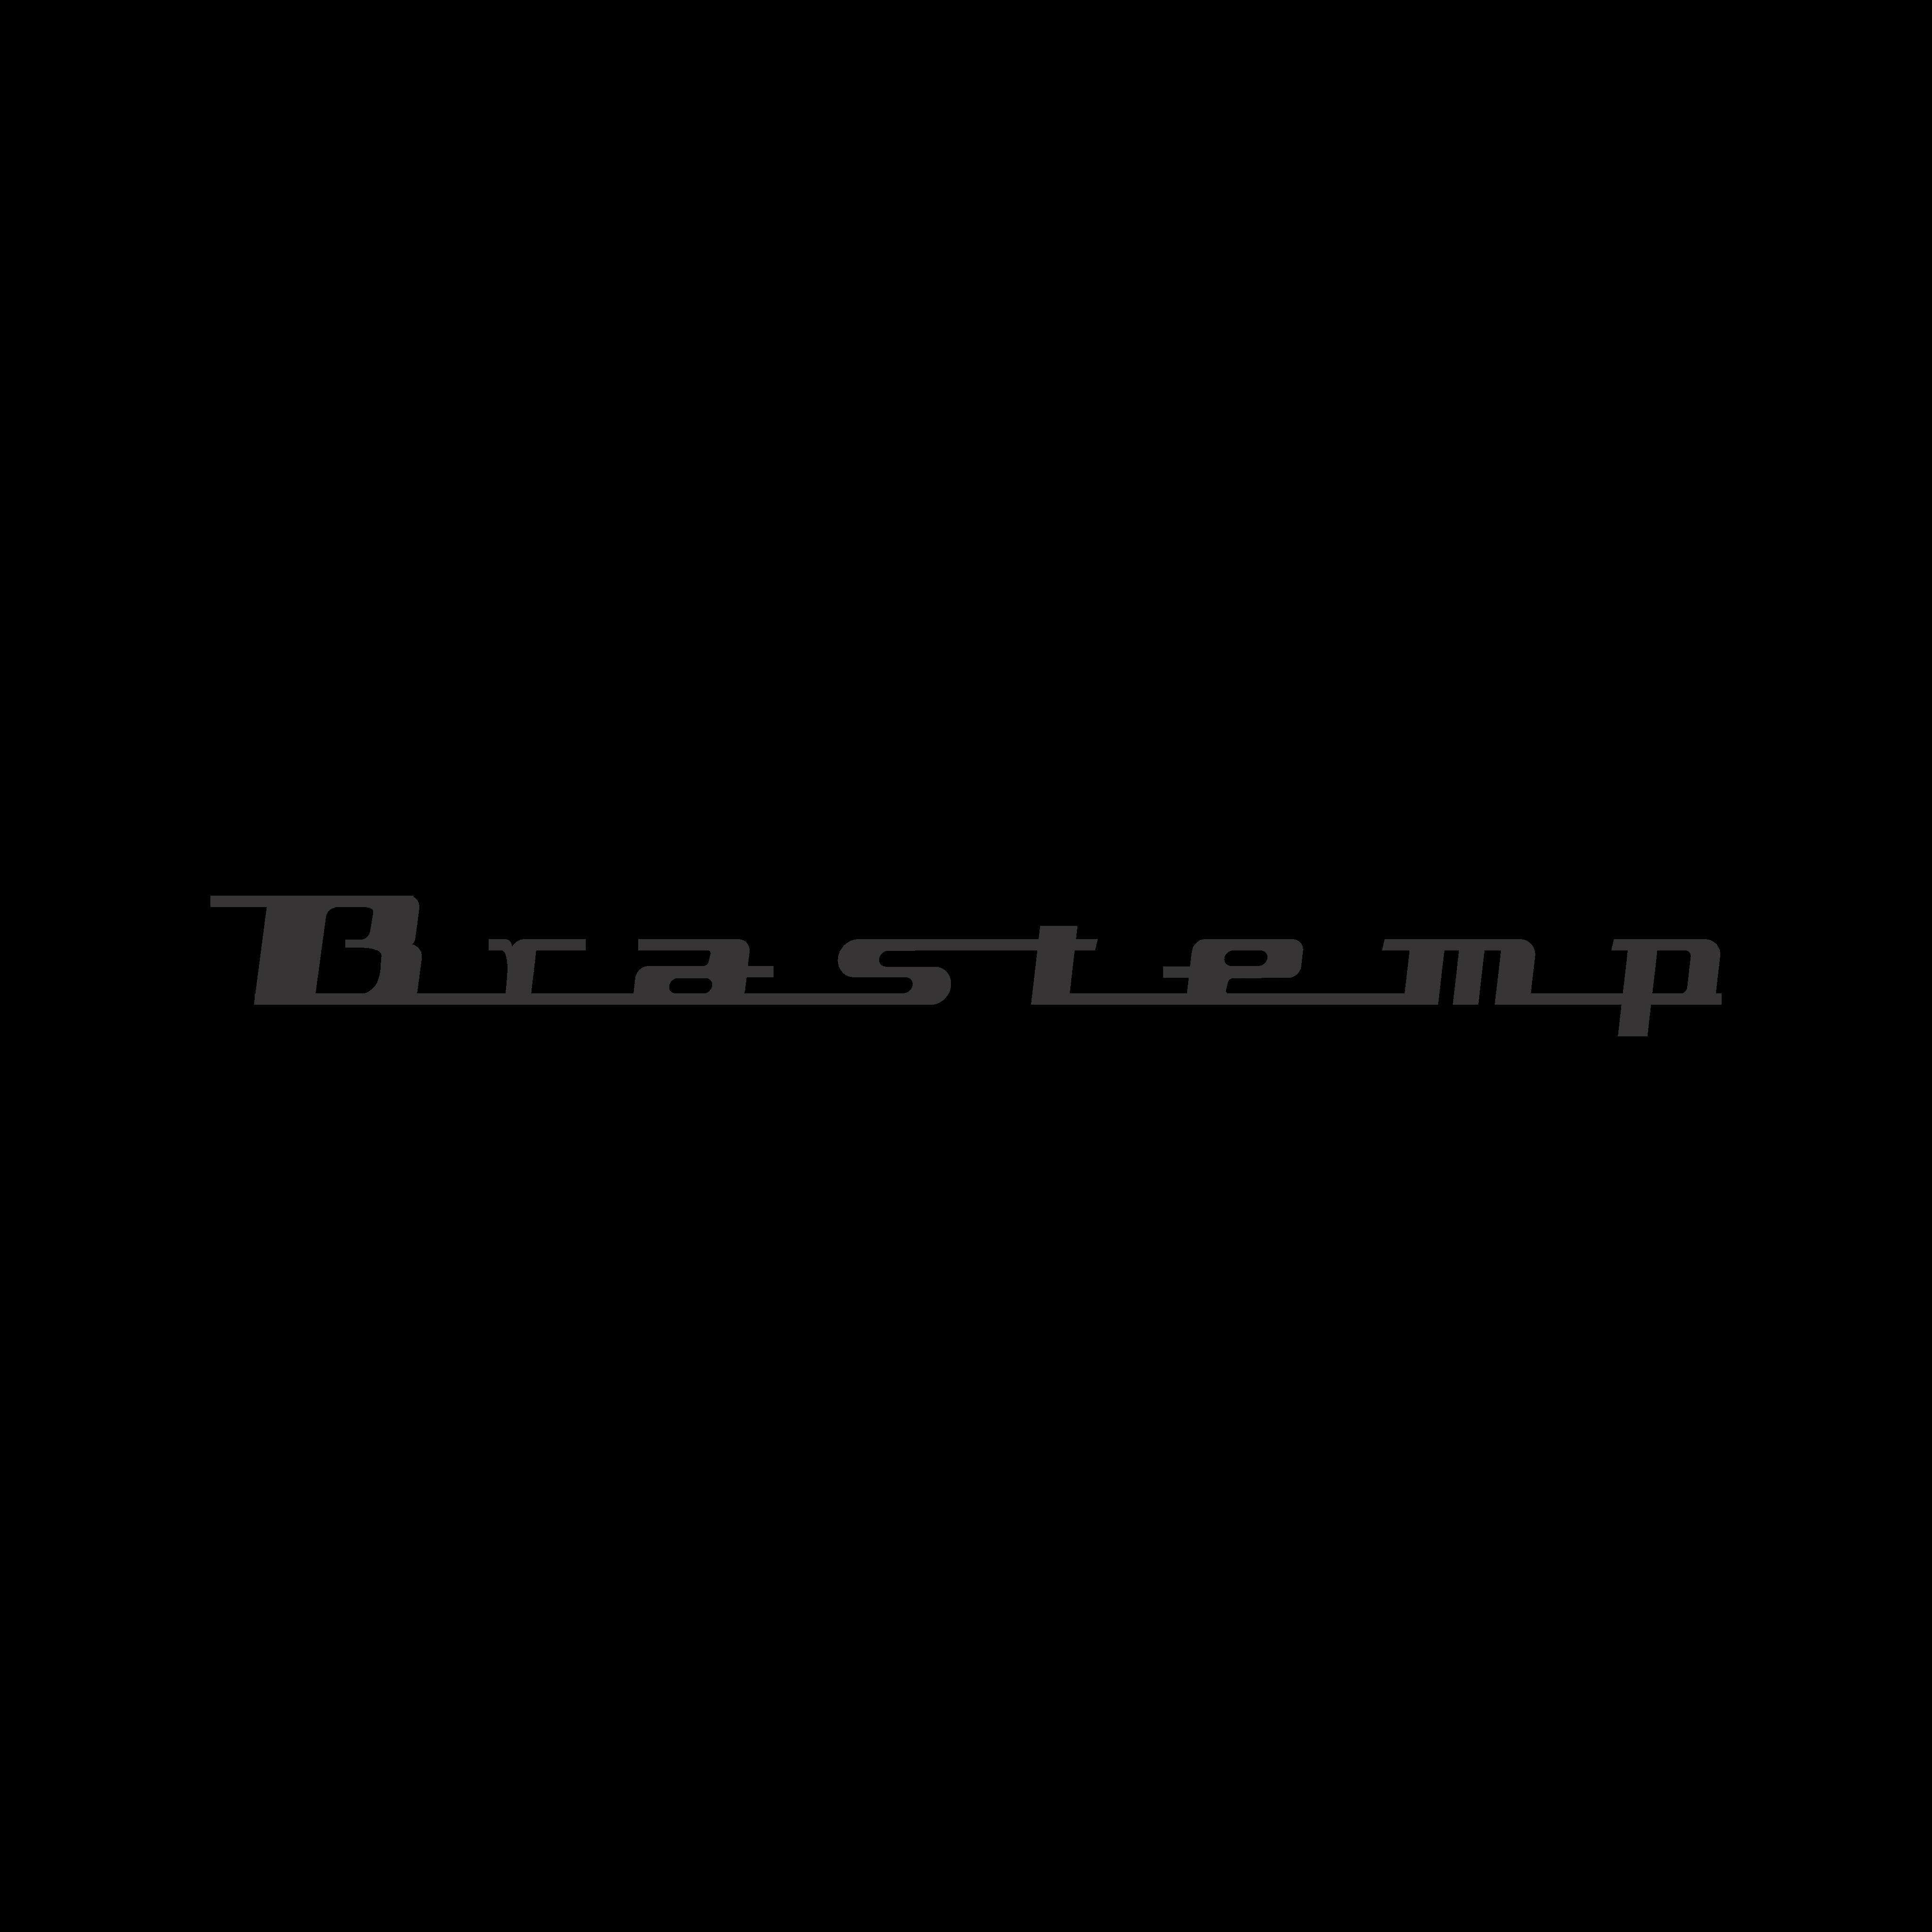 brastemp logo retro 0 - Brastemp Logo (Retro)